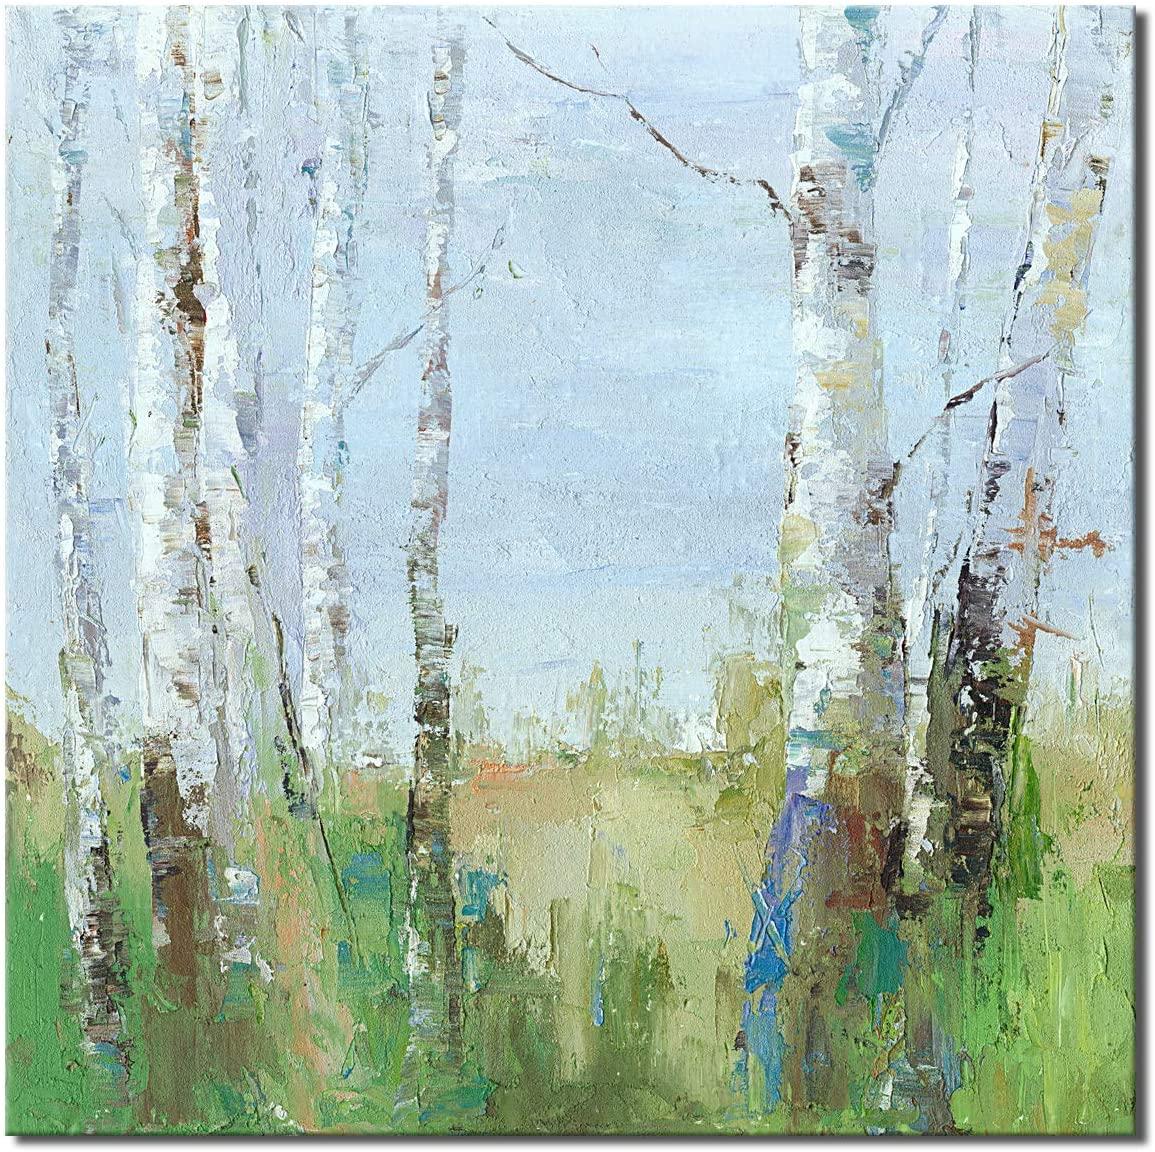 Abstract Landscape Wall Art Modern Birch Tree Canvas Print Forest Artwork for Decor